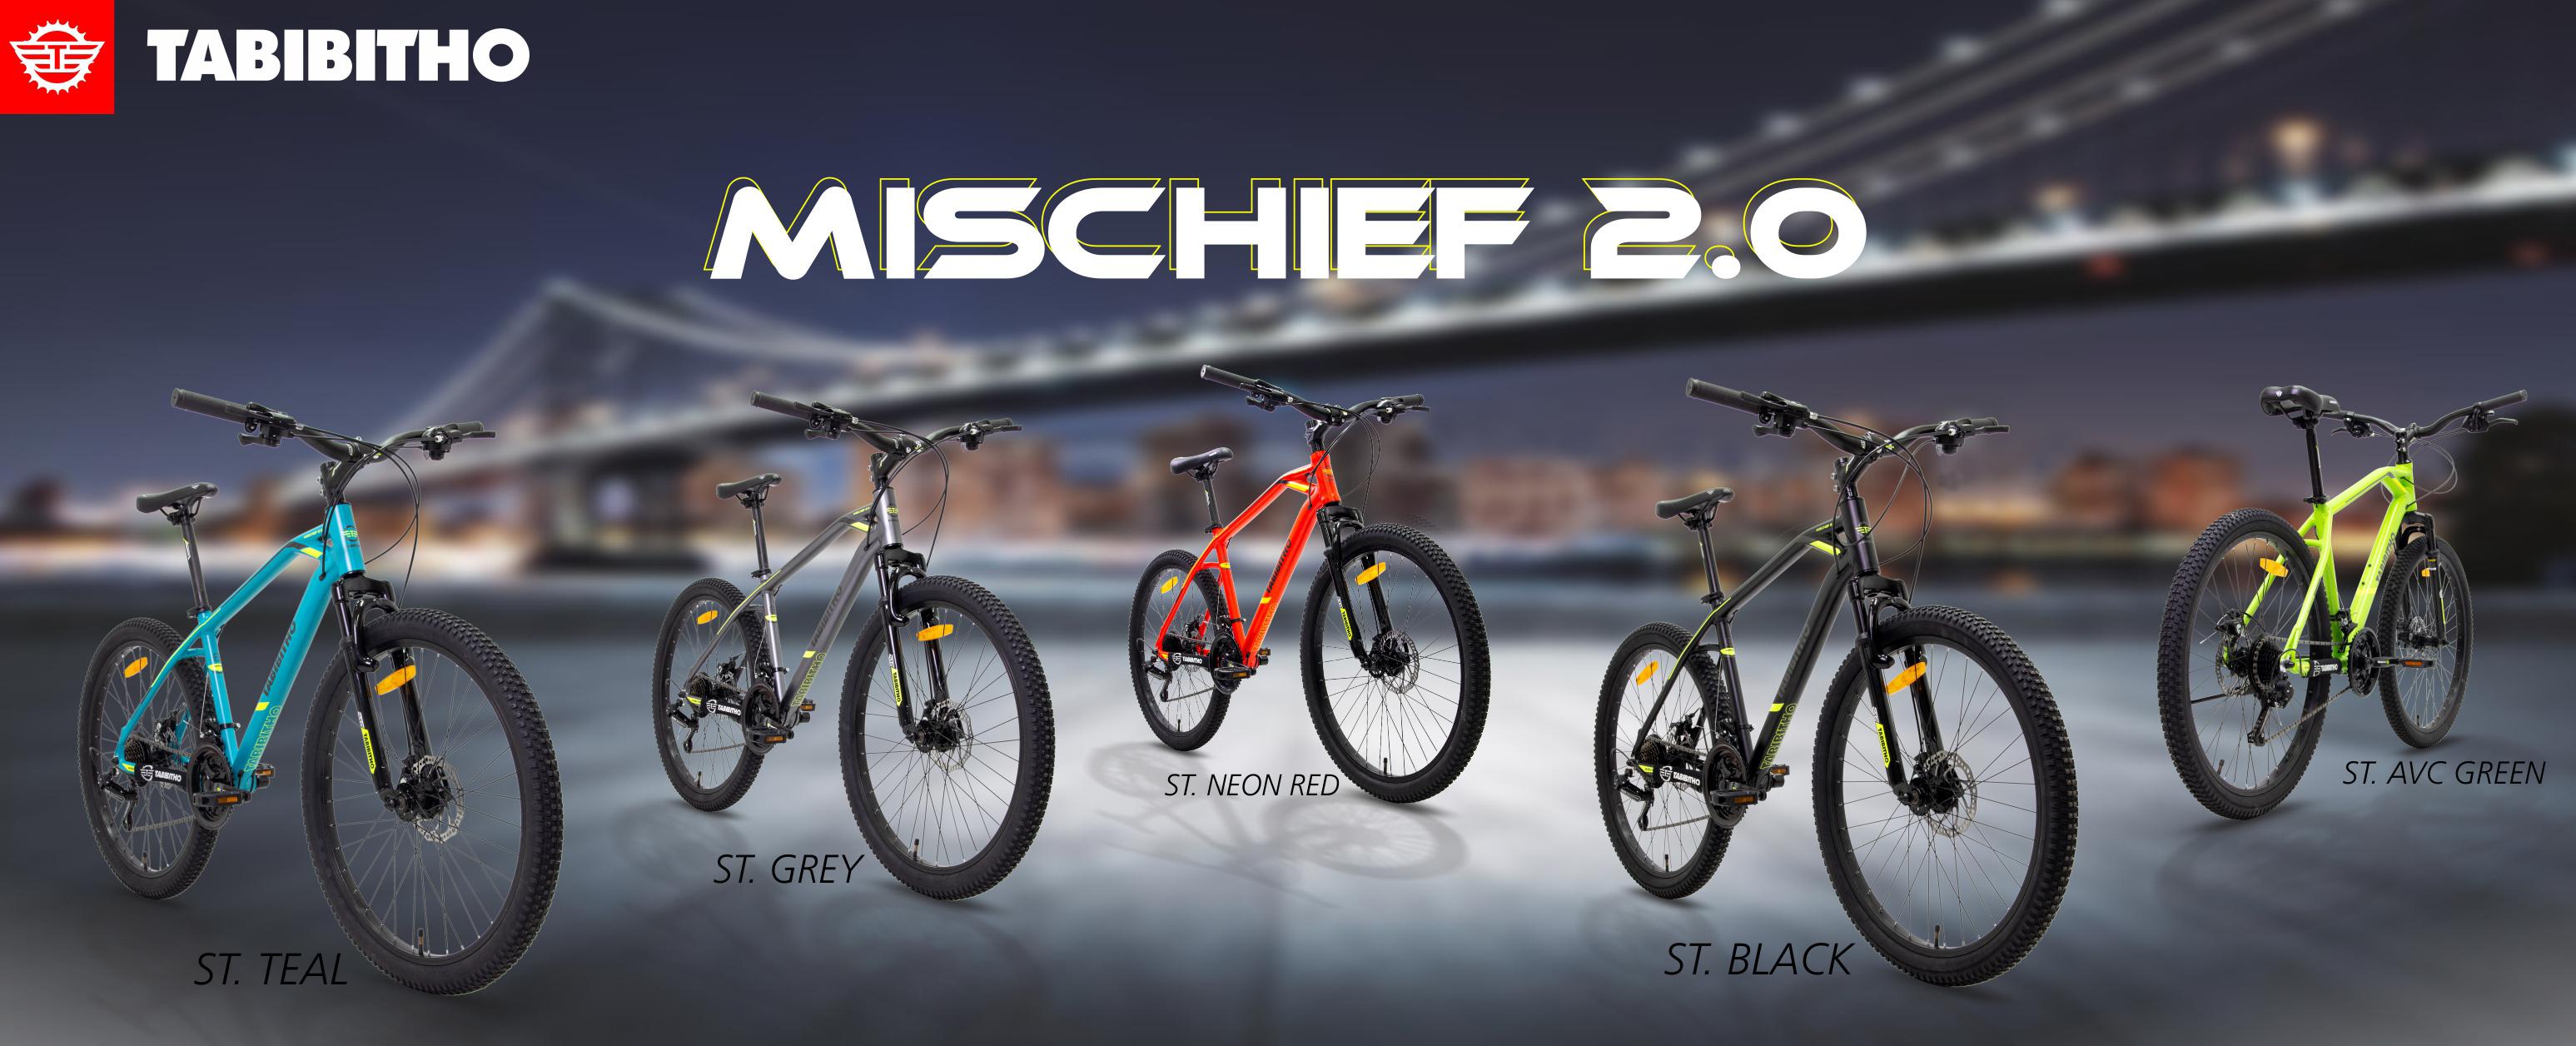 Cover-WEB-Tabibitho-Mischief-Februari-2020